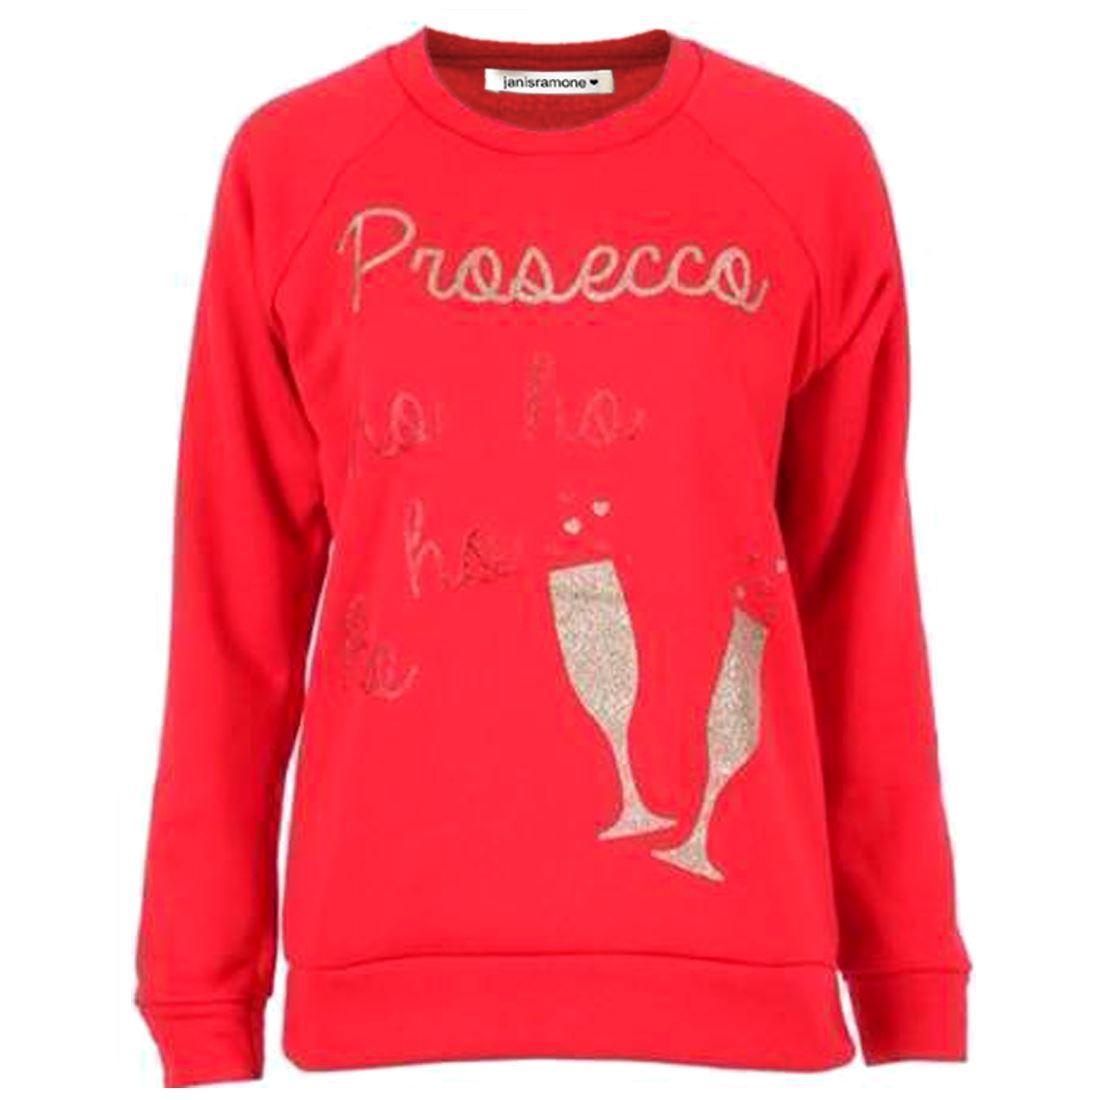 Femme Prosecco HO HO HO paillettes équipe Rudolph Rudolph équipe Fleece Sweatshirt De Noël Pull 941fe3